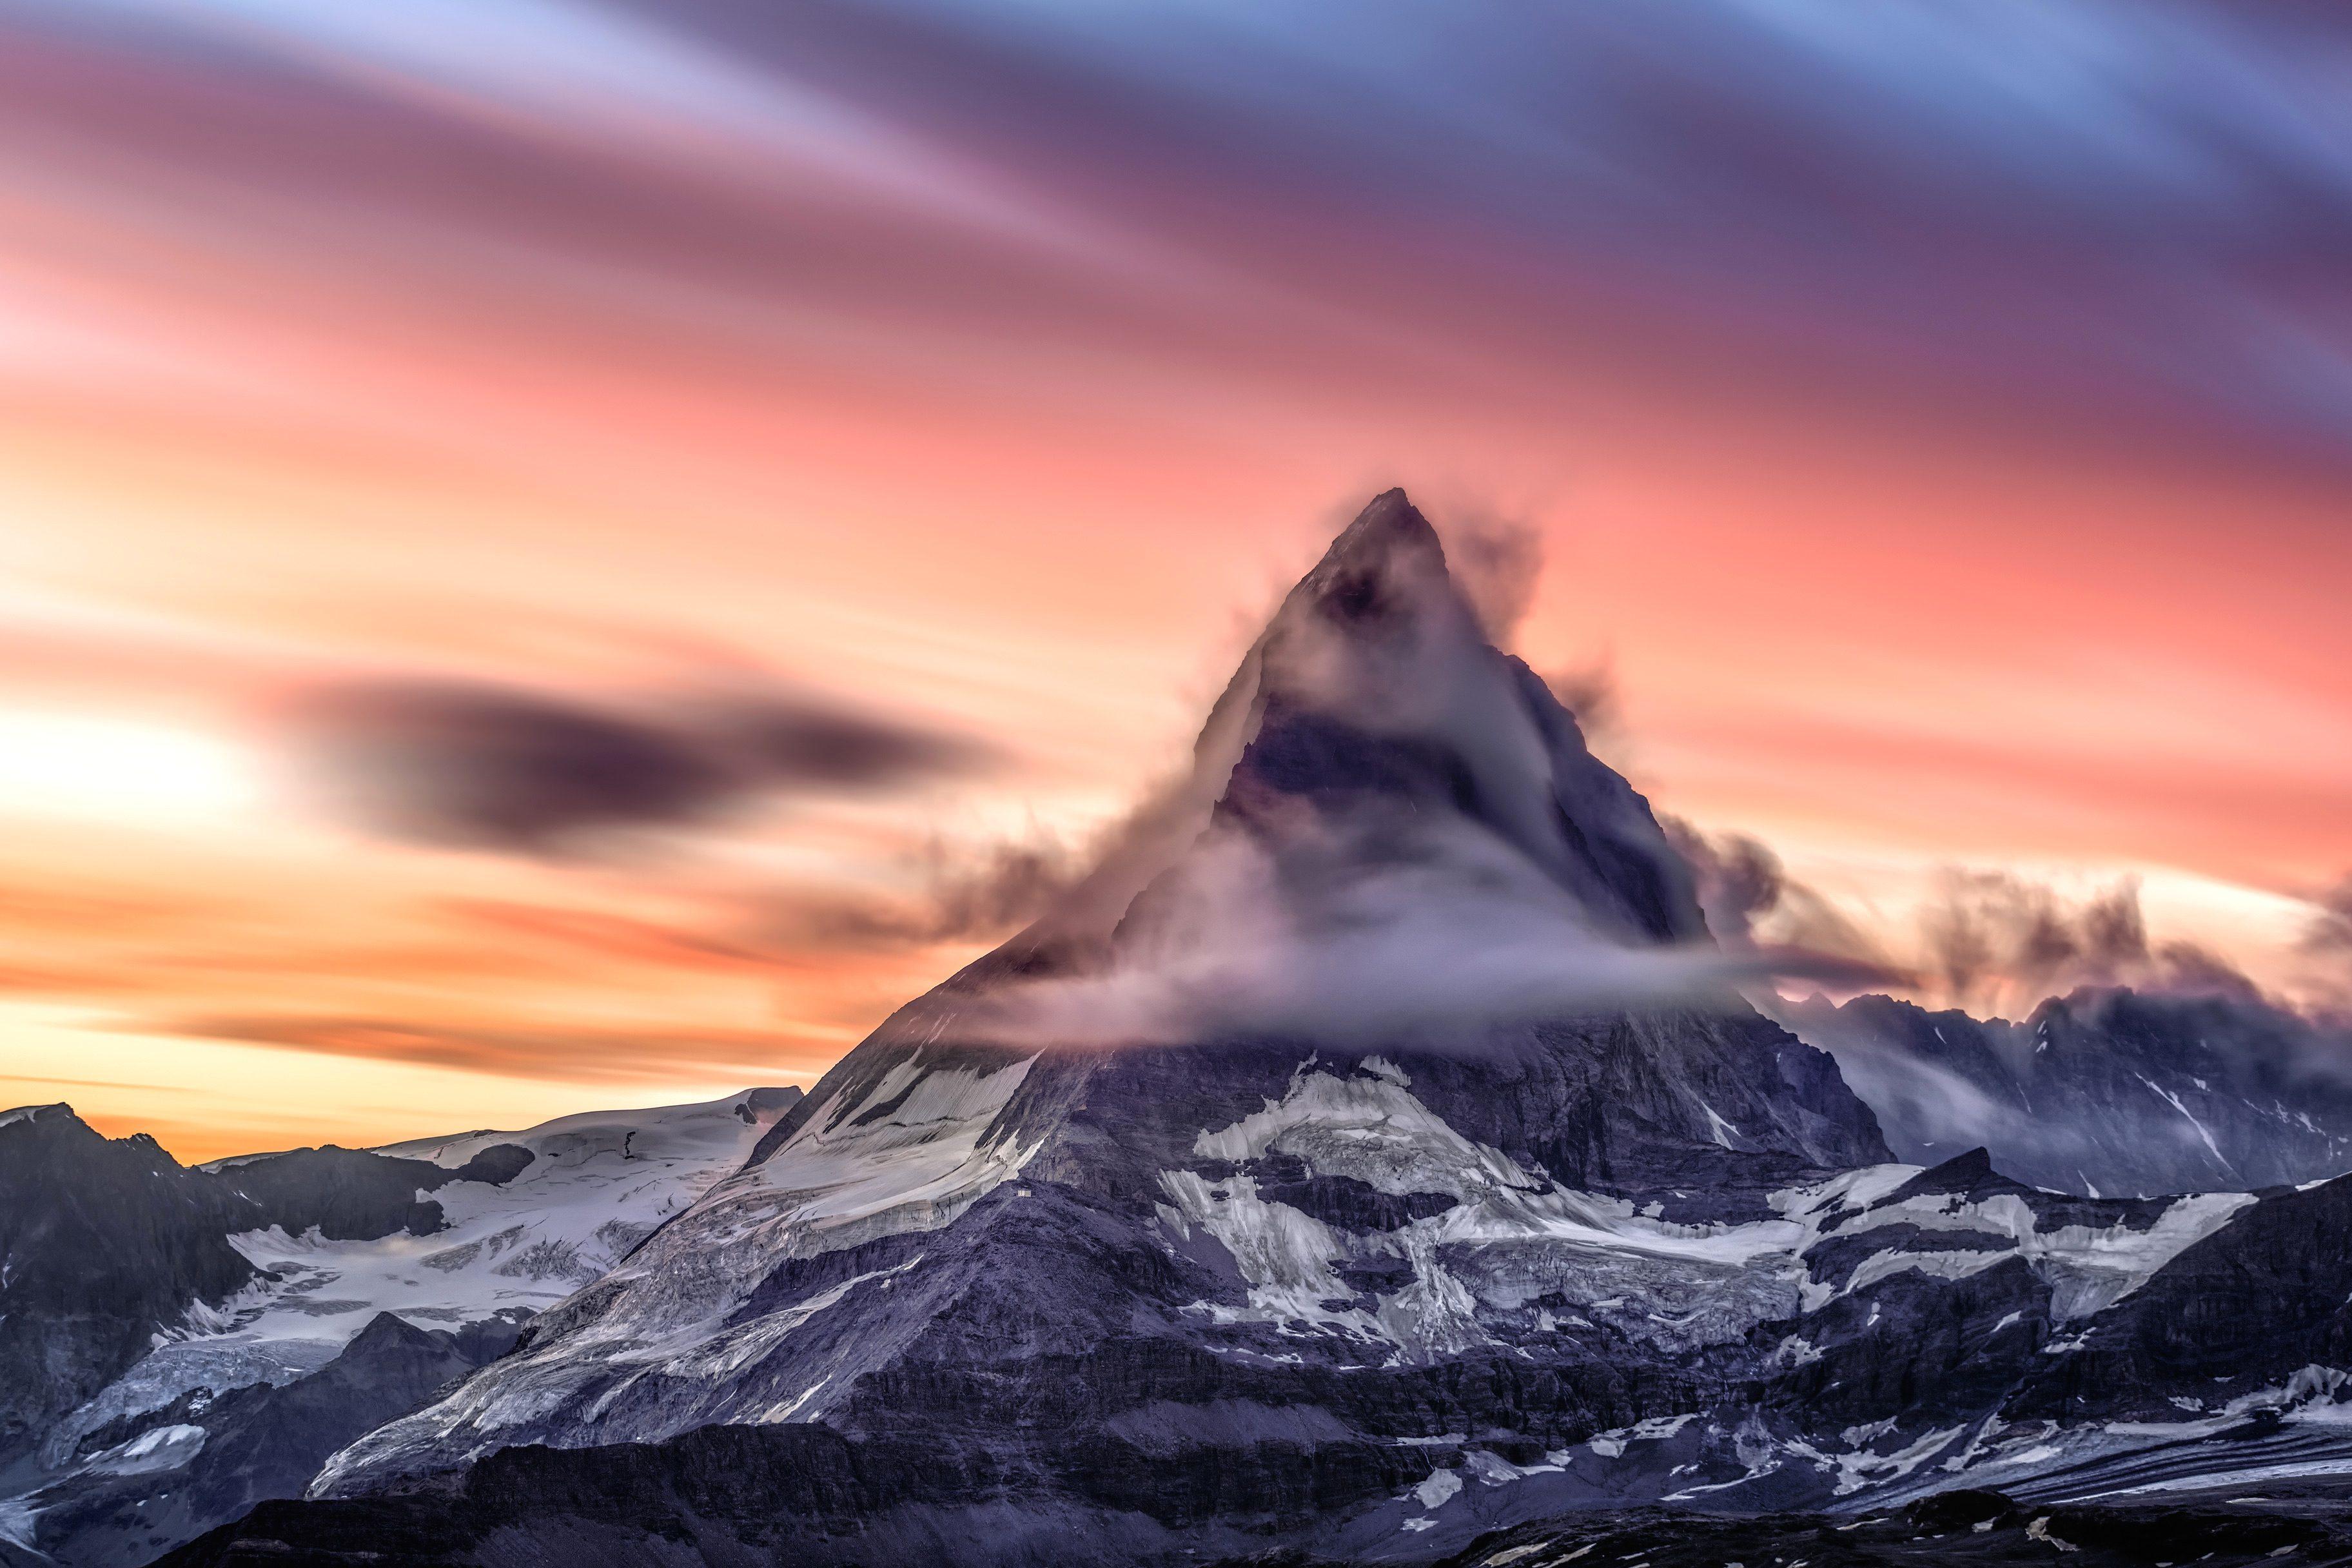 Free picture: mountain peak, sky, snow, sunset, mountain, landscape